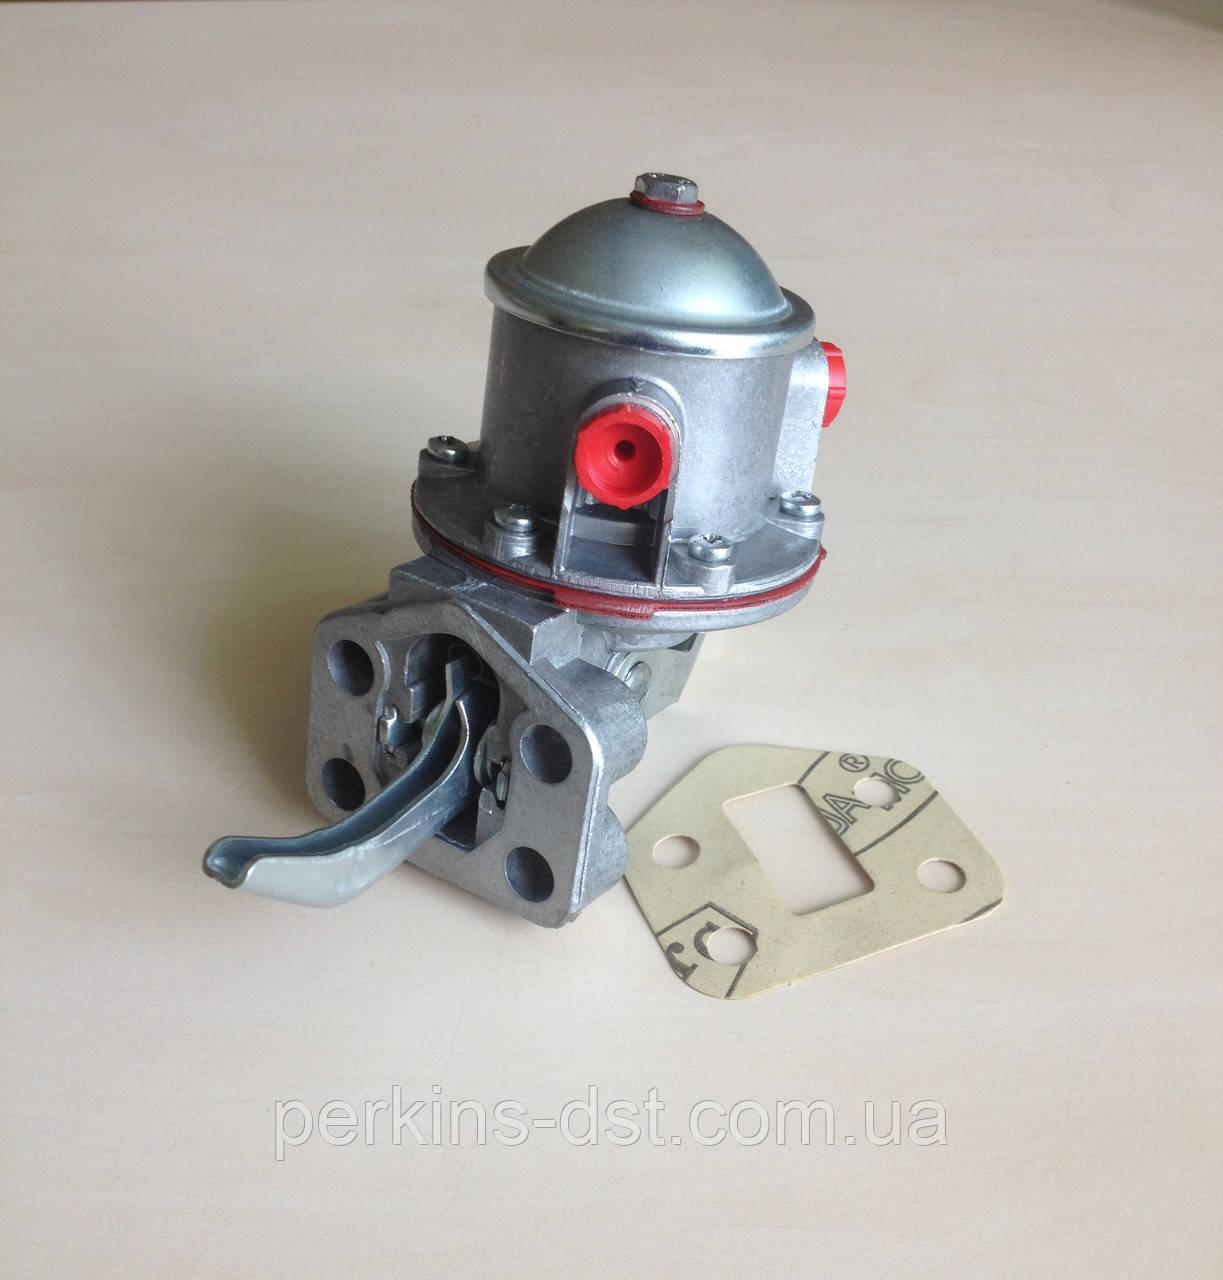 Насос підкачки (бензонасос) для двигуна Perkins 1006 серії